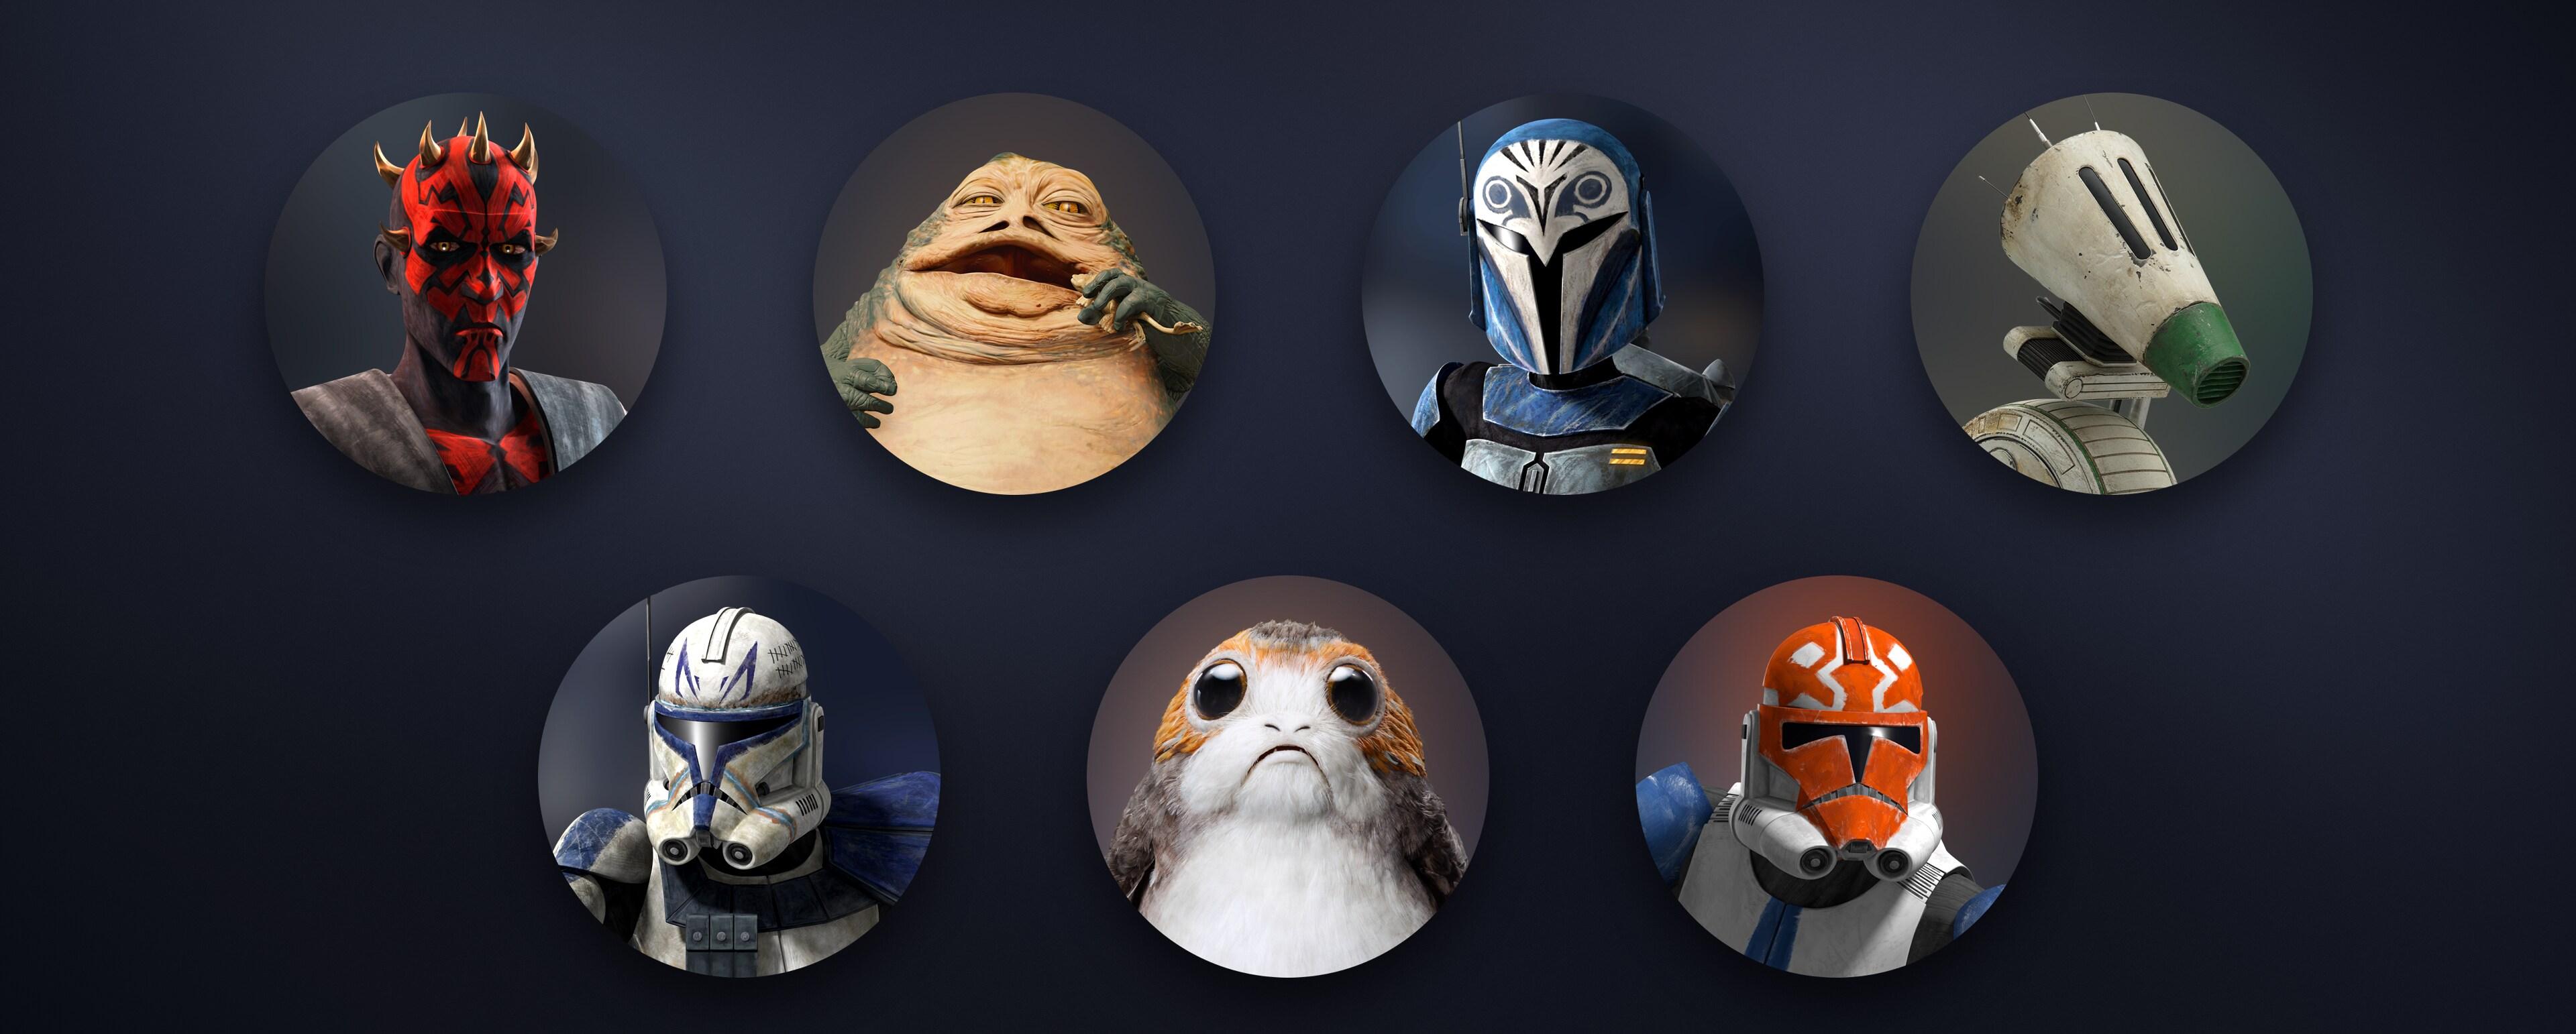 Star Wars new avatars on disney+